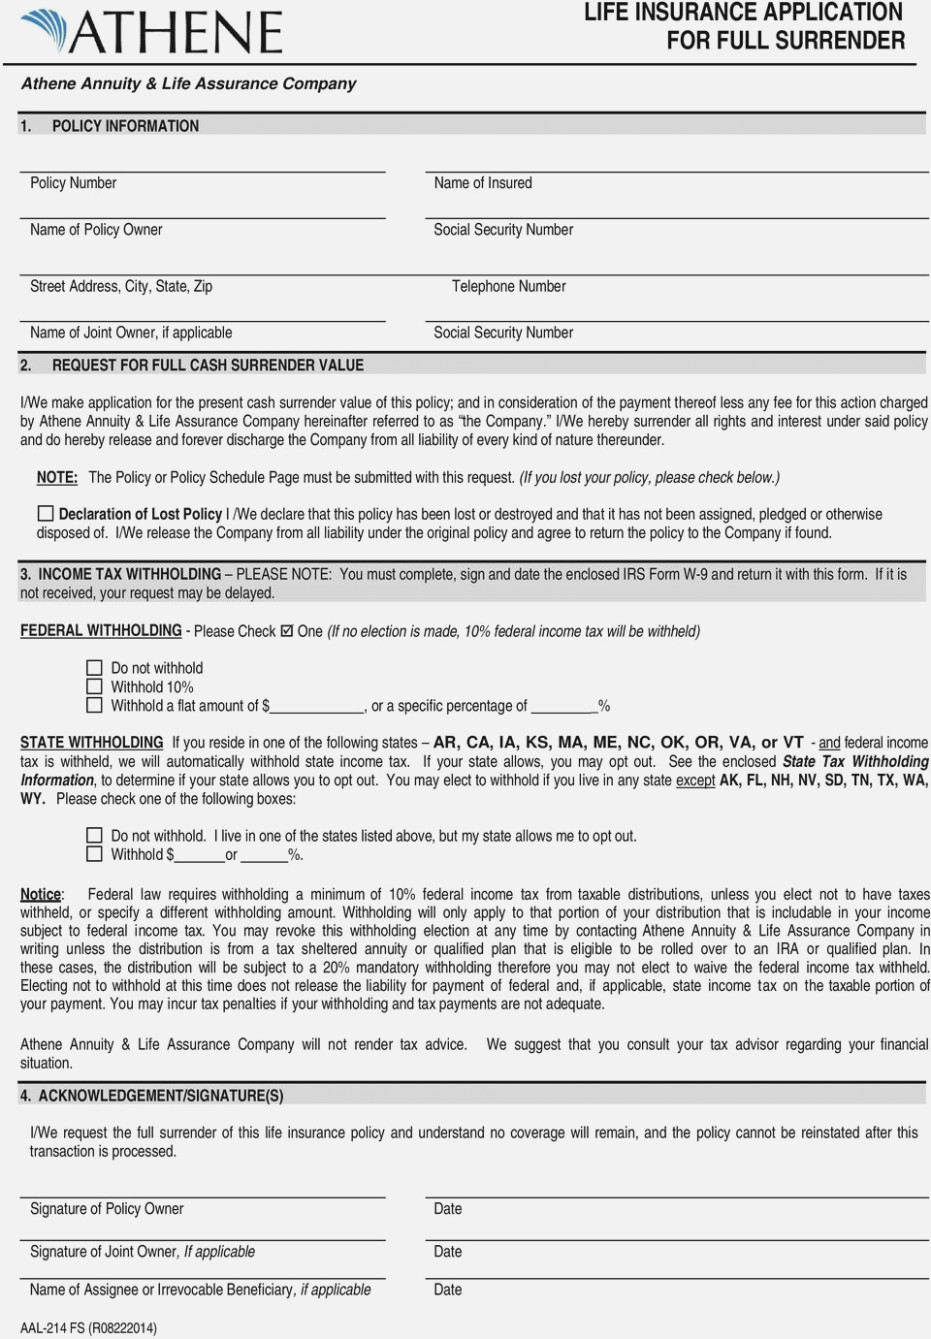 Transamerica Life Insurance Application Form